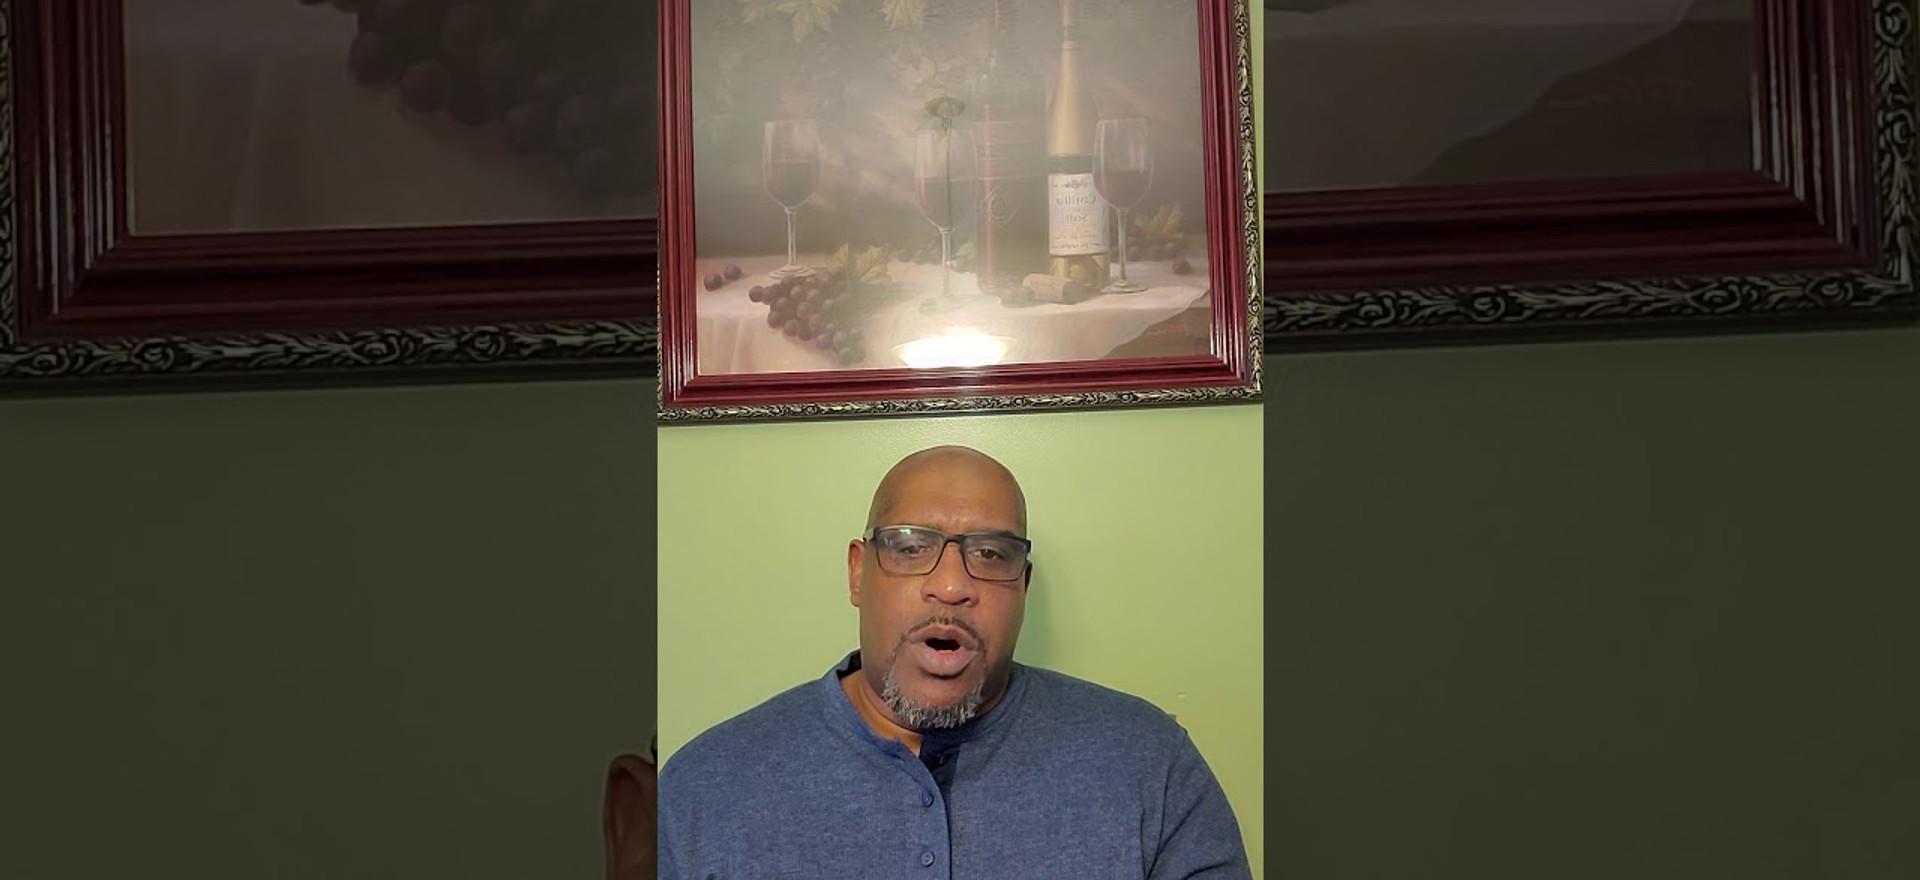 2.4.21 - Video Testimonial - Mr. Shabazz